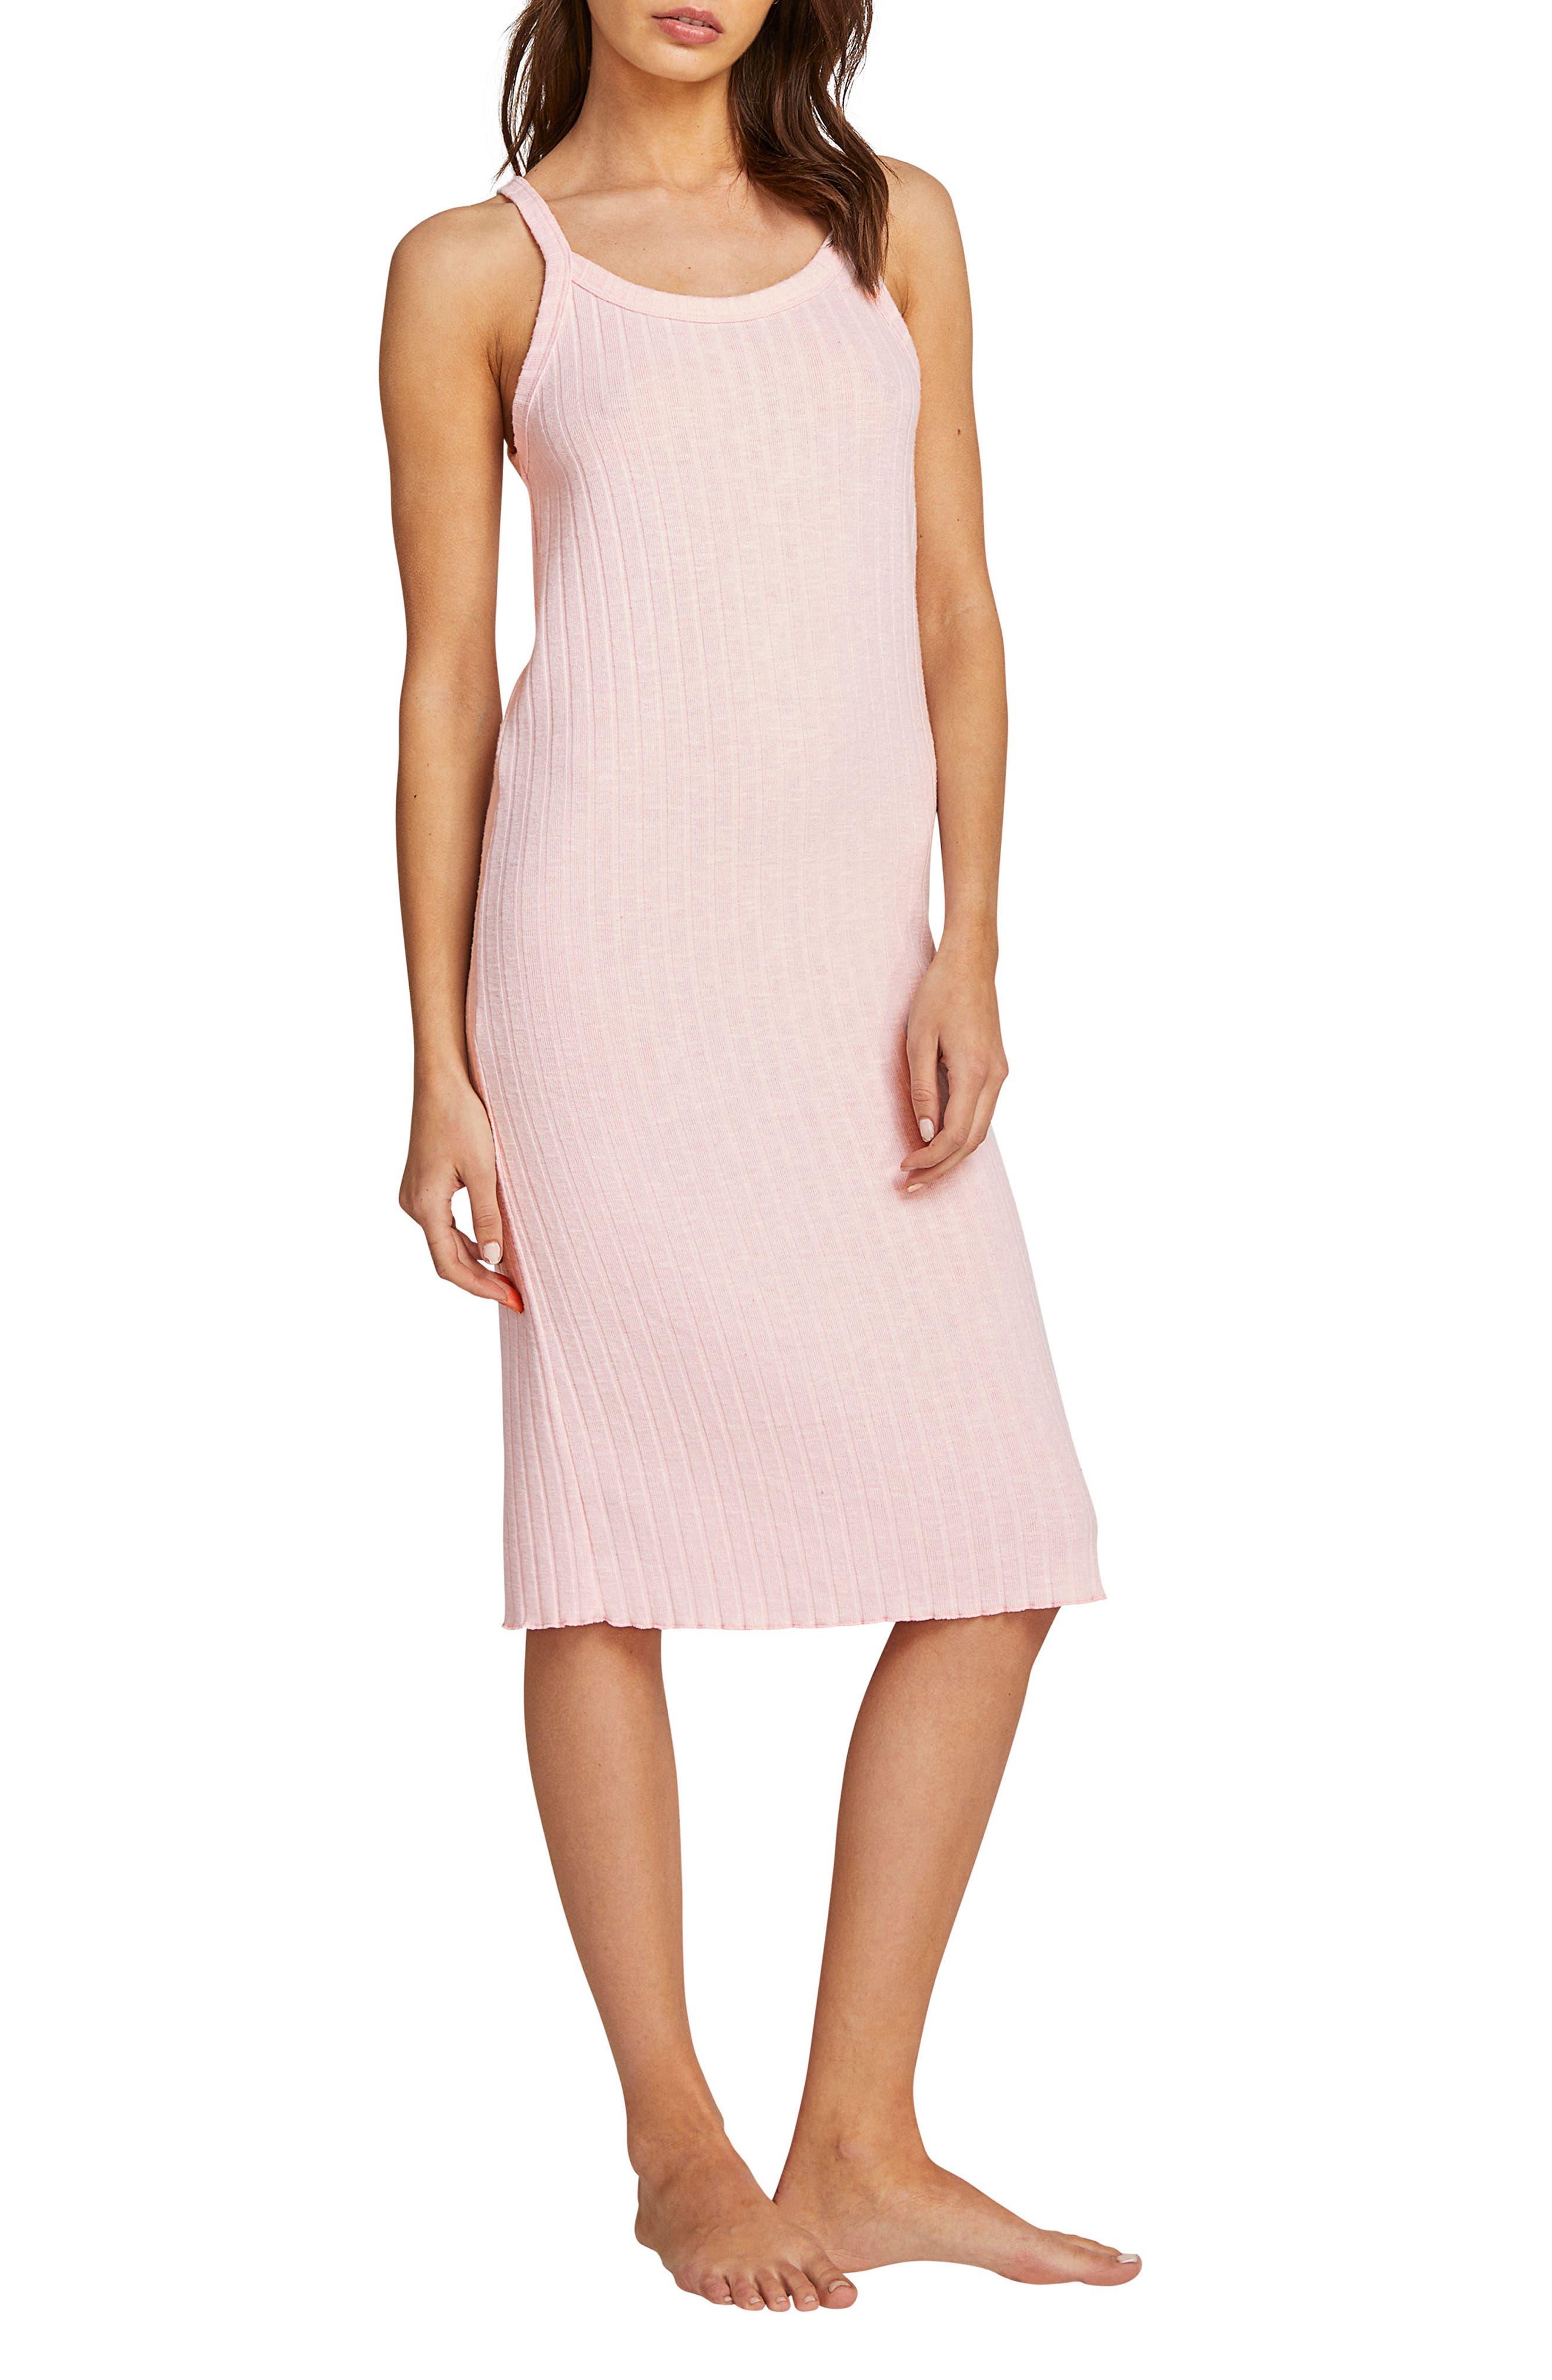 VOLCOM Lil Dress, Main, color, PINK BLUSH